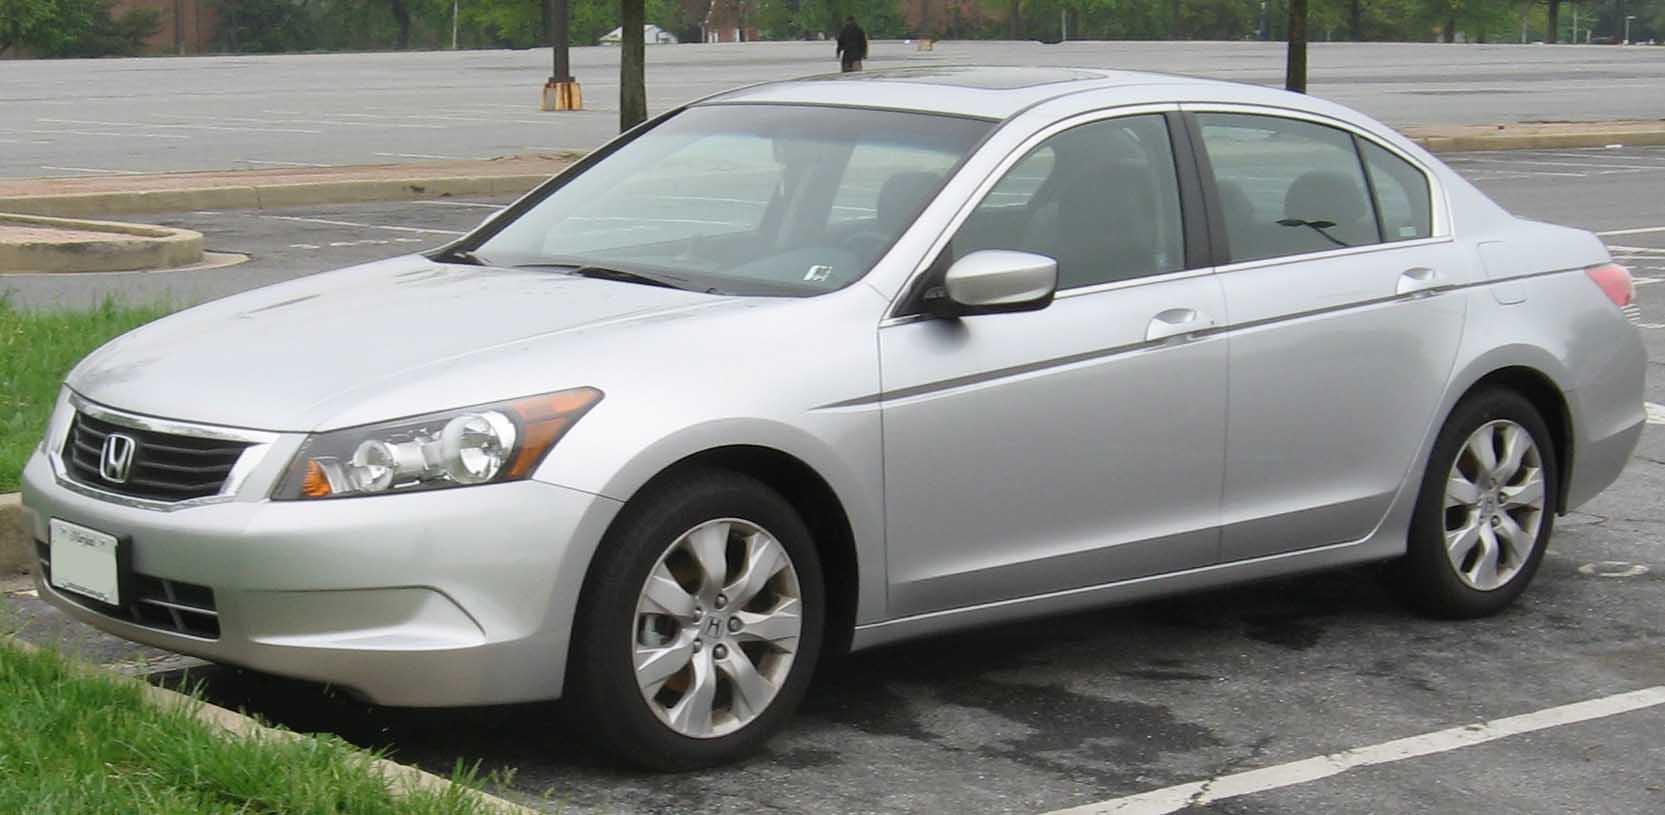 Honda Accord North America Eighth Generation Wikipedia 2004 Crv Lx L4 24 Liter Gas Exhaust Components